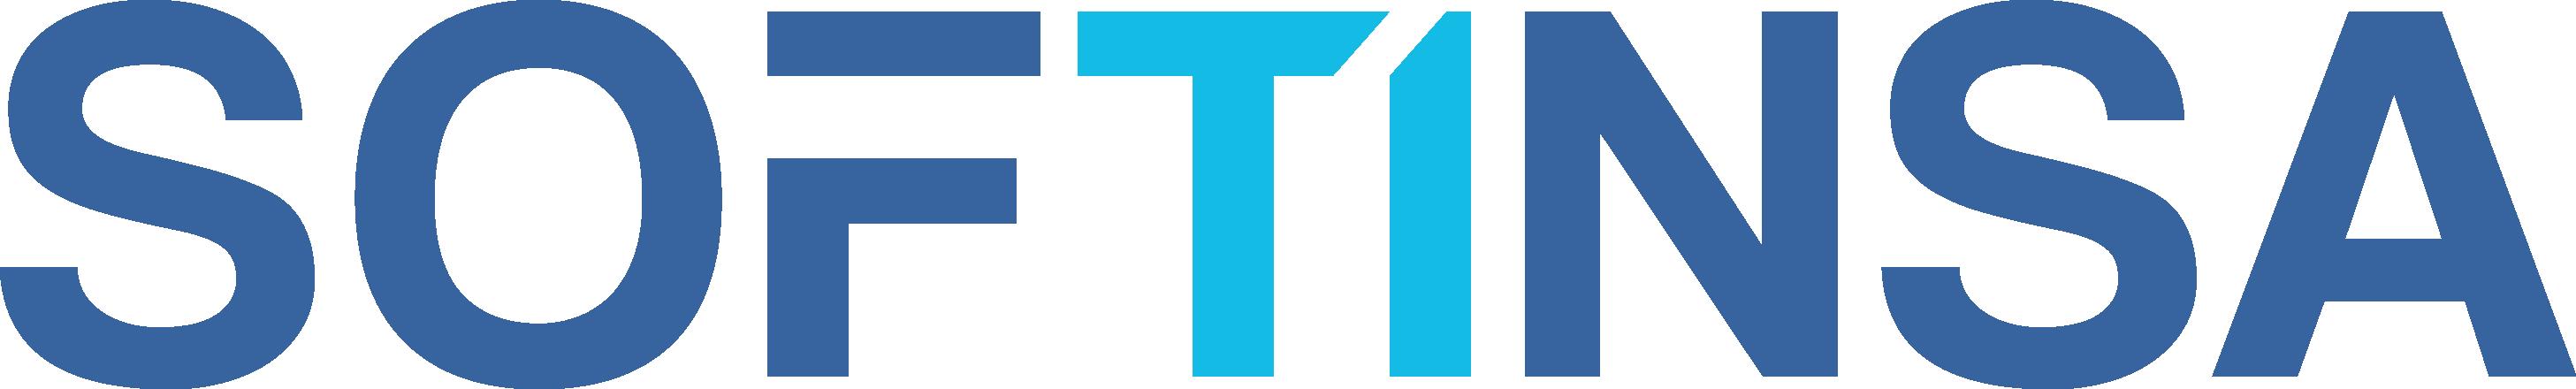 logotipo_softinsa